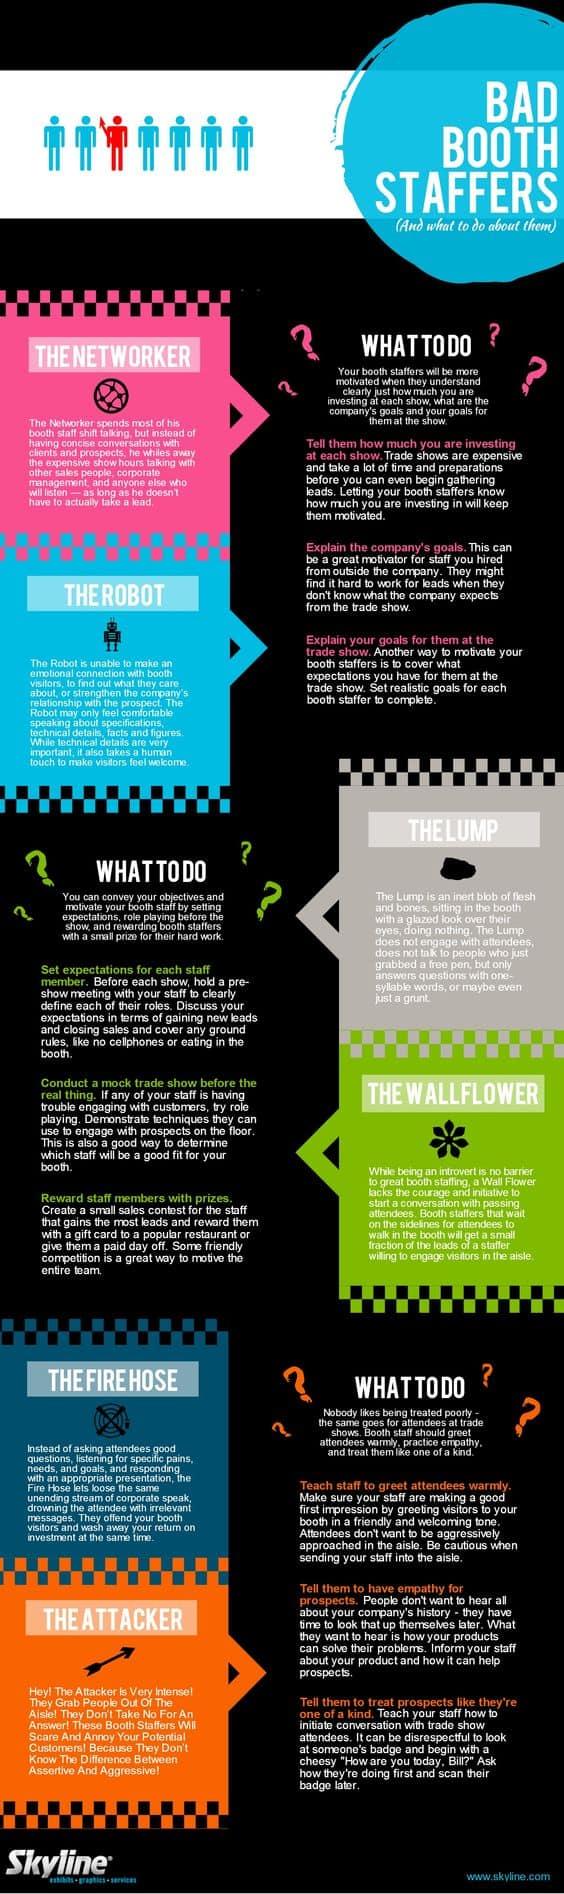 Skyline - Bad booth staffers infographic